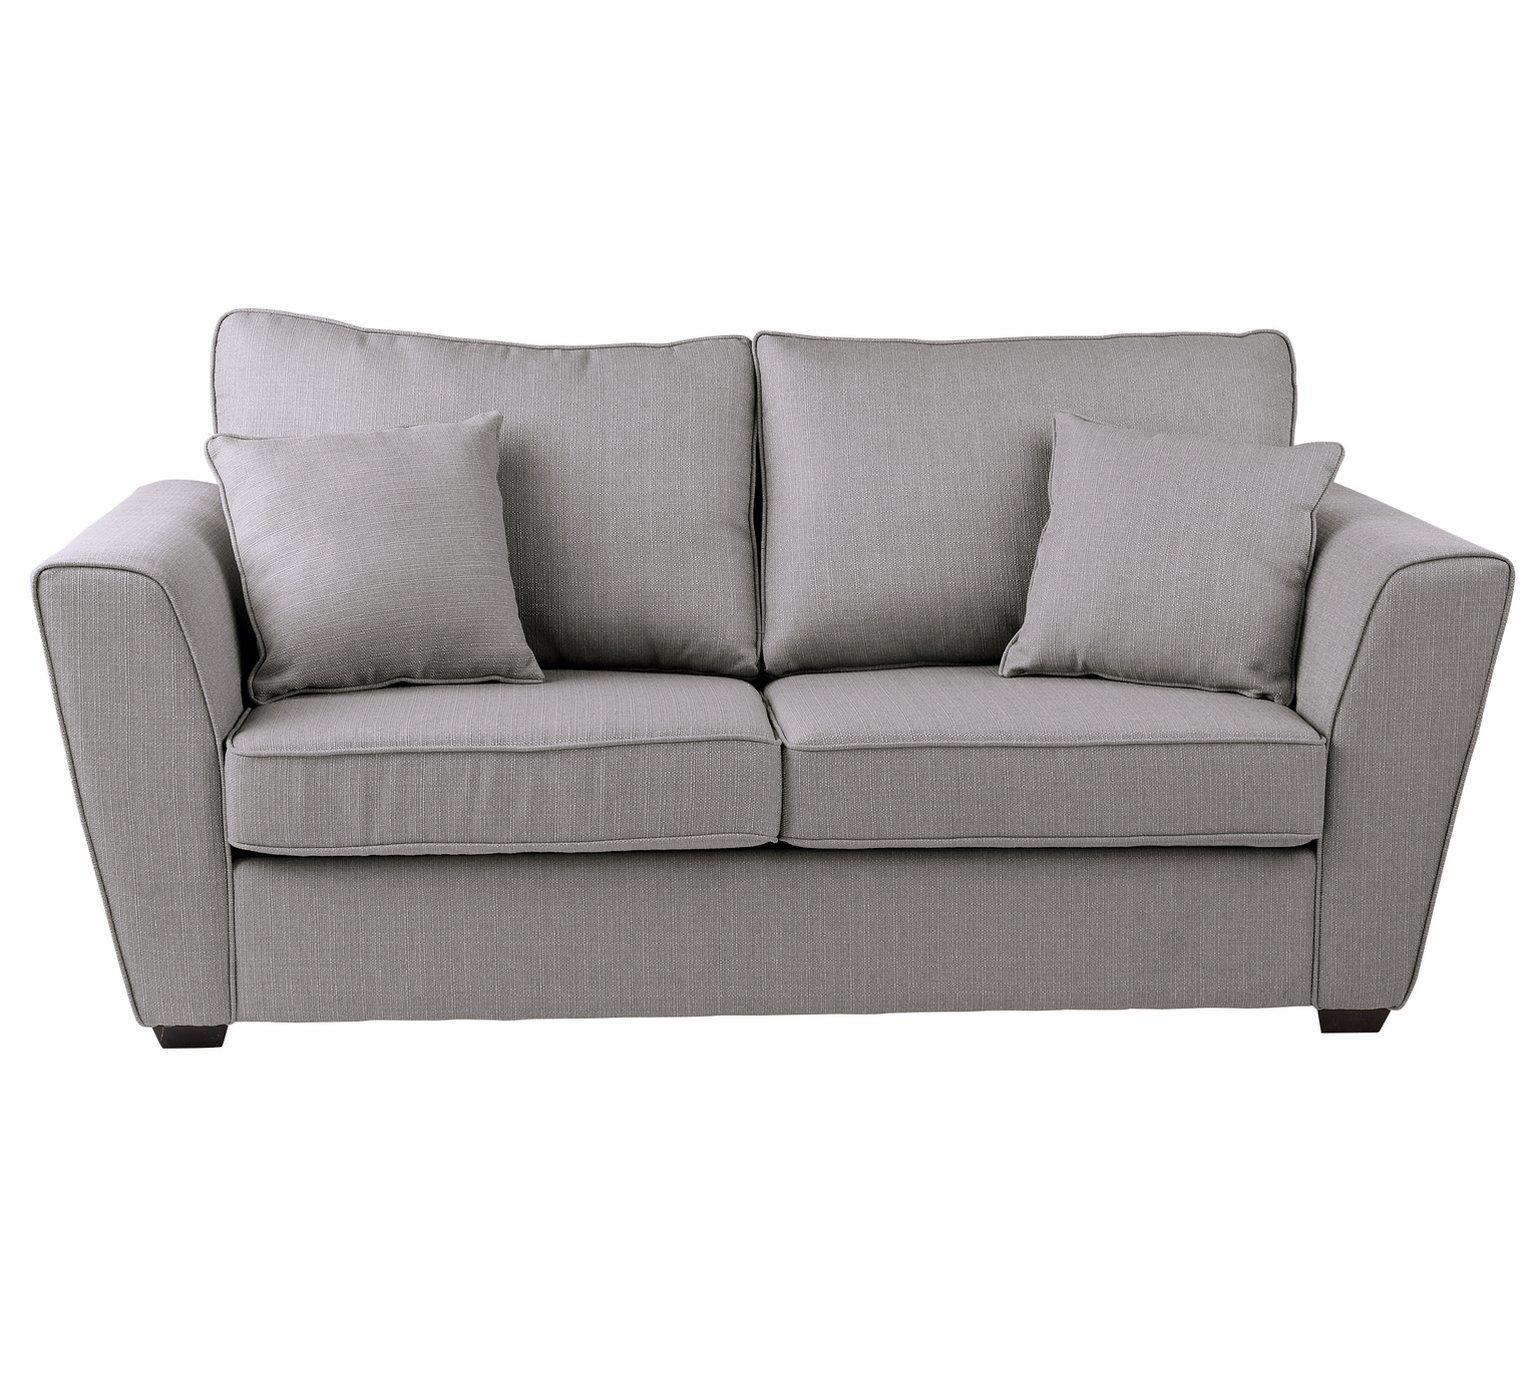 Astounding Buy Collection Renley 2 Seater Fabric Sofa Bed Light Grey Machost Co Dining Chair Design Ideas Machostcouk